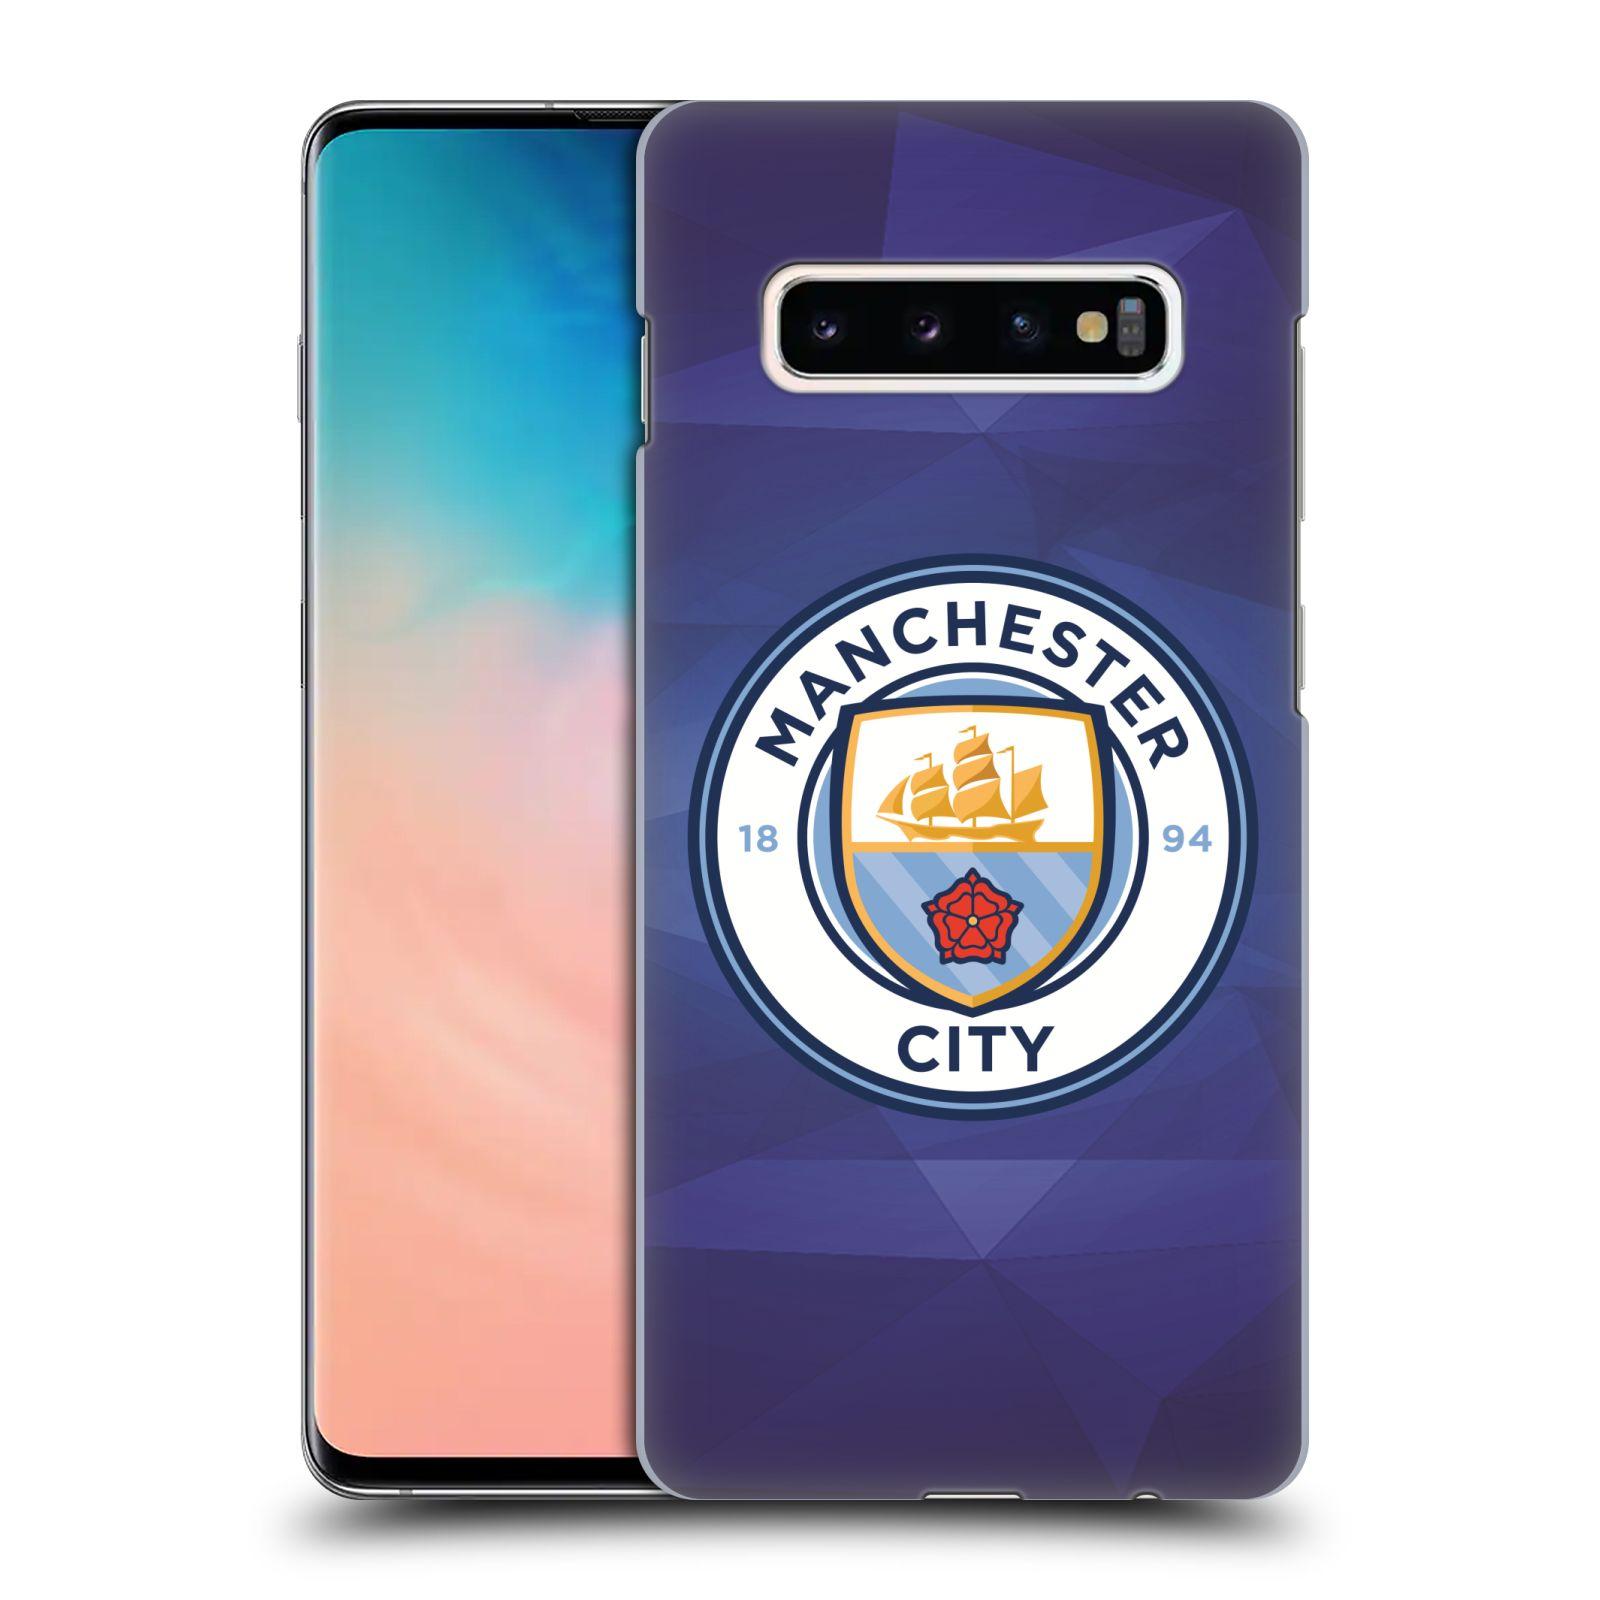 Plastové pouzdro na mobil Samsung Galaxy S10 Plus - Head Case - Manchester City FC - Modré nové logo